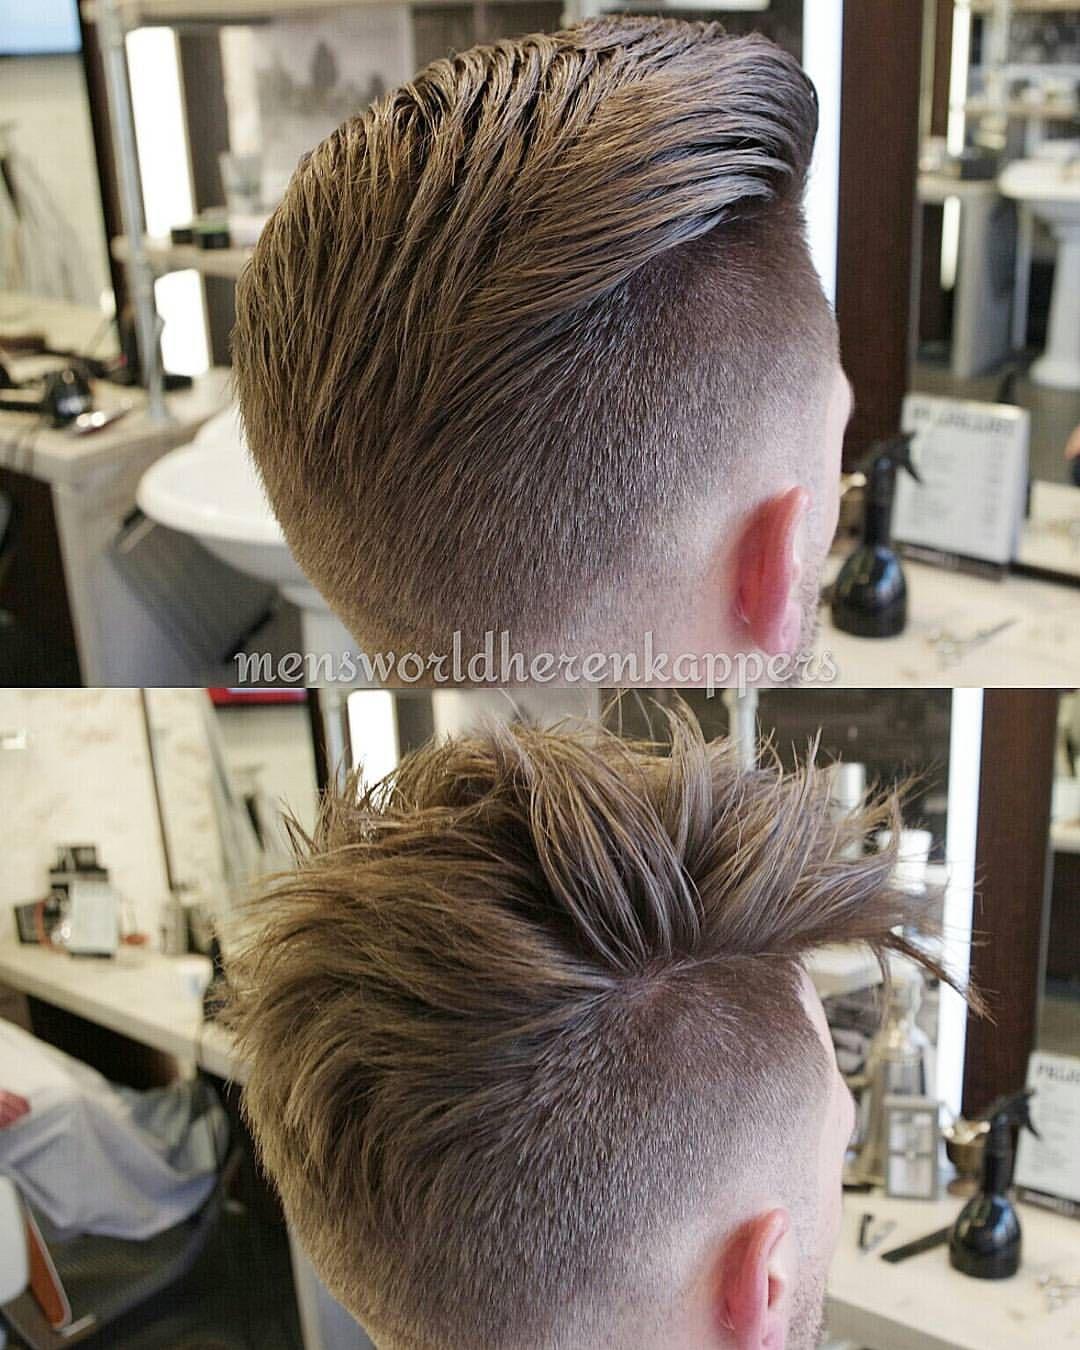 "Men's World Herenkappers⚪ on Instagram: ""1 or 2?  #Menshairstyle #hairmenstyle #barbershopconnect #modernsalon #thebarberpost #barbersinctv #menshaircut #hairstylist #hairdressing #barberlove #barbergang #barberlife #barbergame #barberlove #undercut #hairstyle #mensgrooming #menslook #mensfashion #barbershop #barbering #barber #groningen #haircut #Zwolle #Enschede #kapper #guyswithstyle #barbier #hairdresser"""